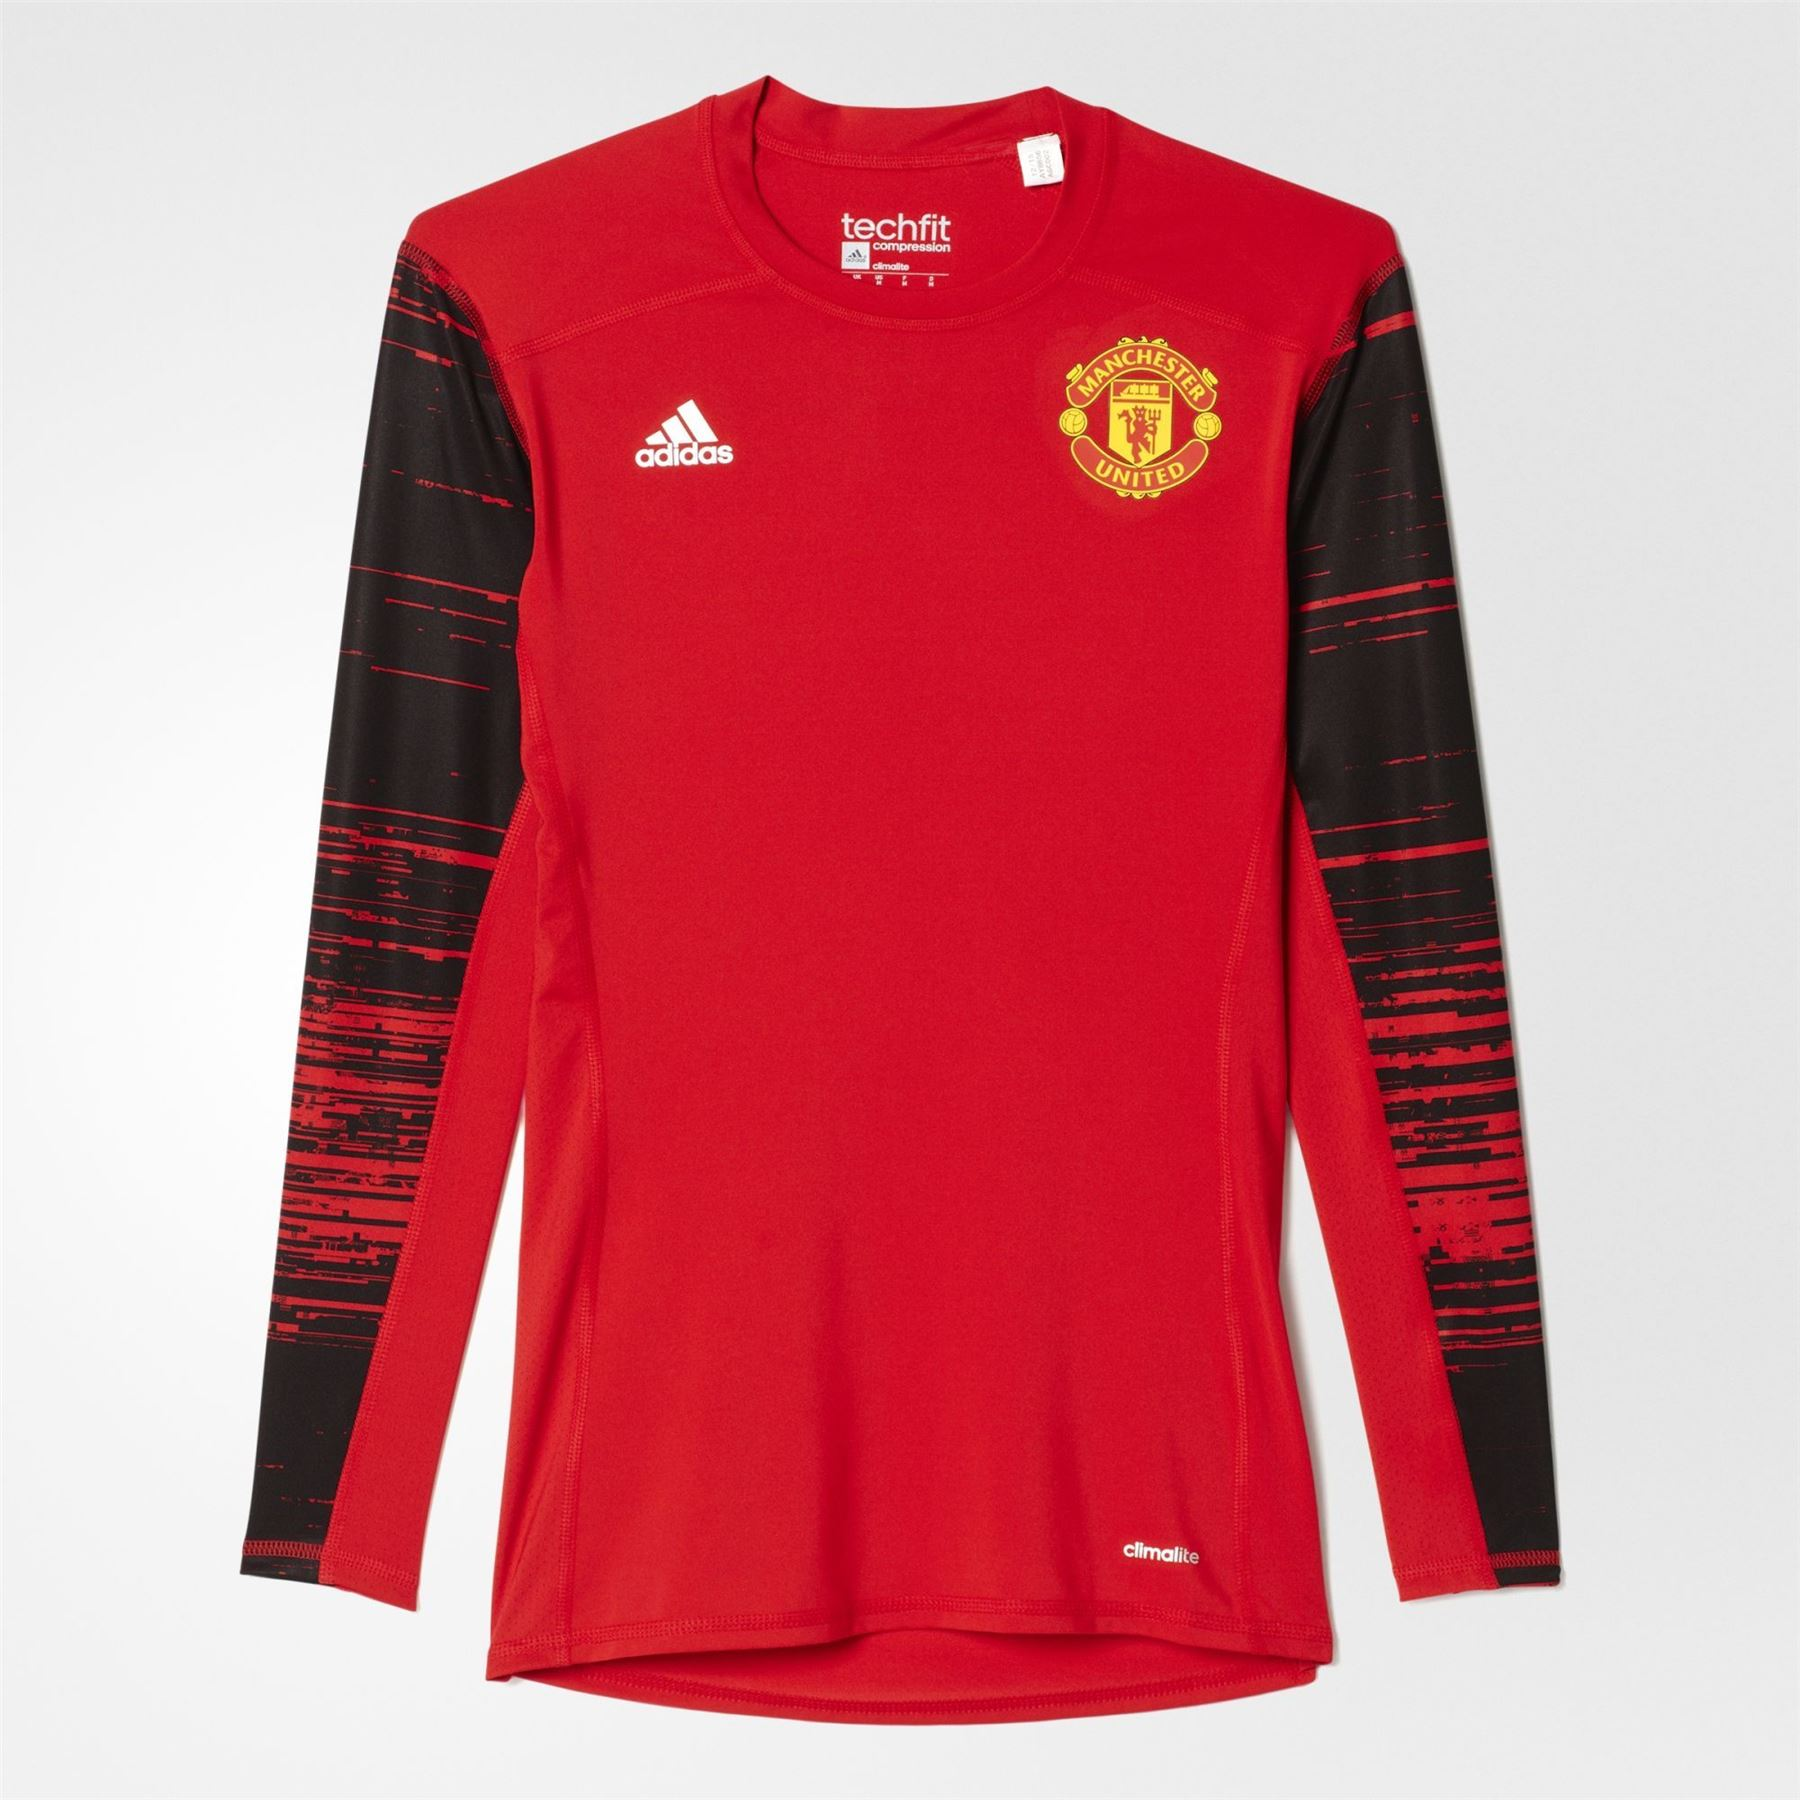 875ec1c1c0d New Man Utd Shirt Adidas - Cotswold Hire